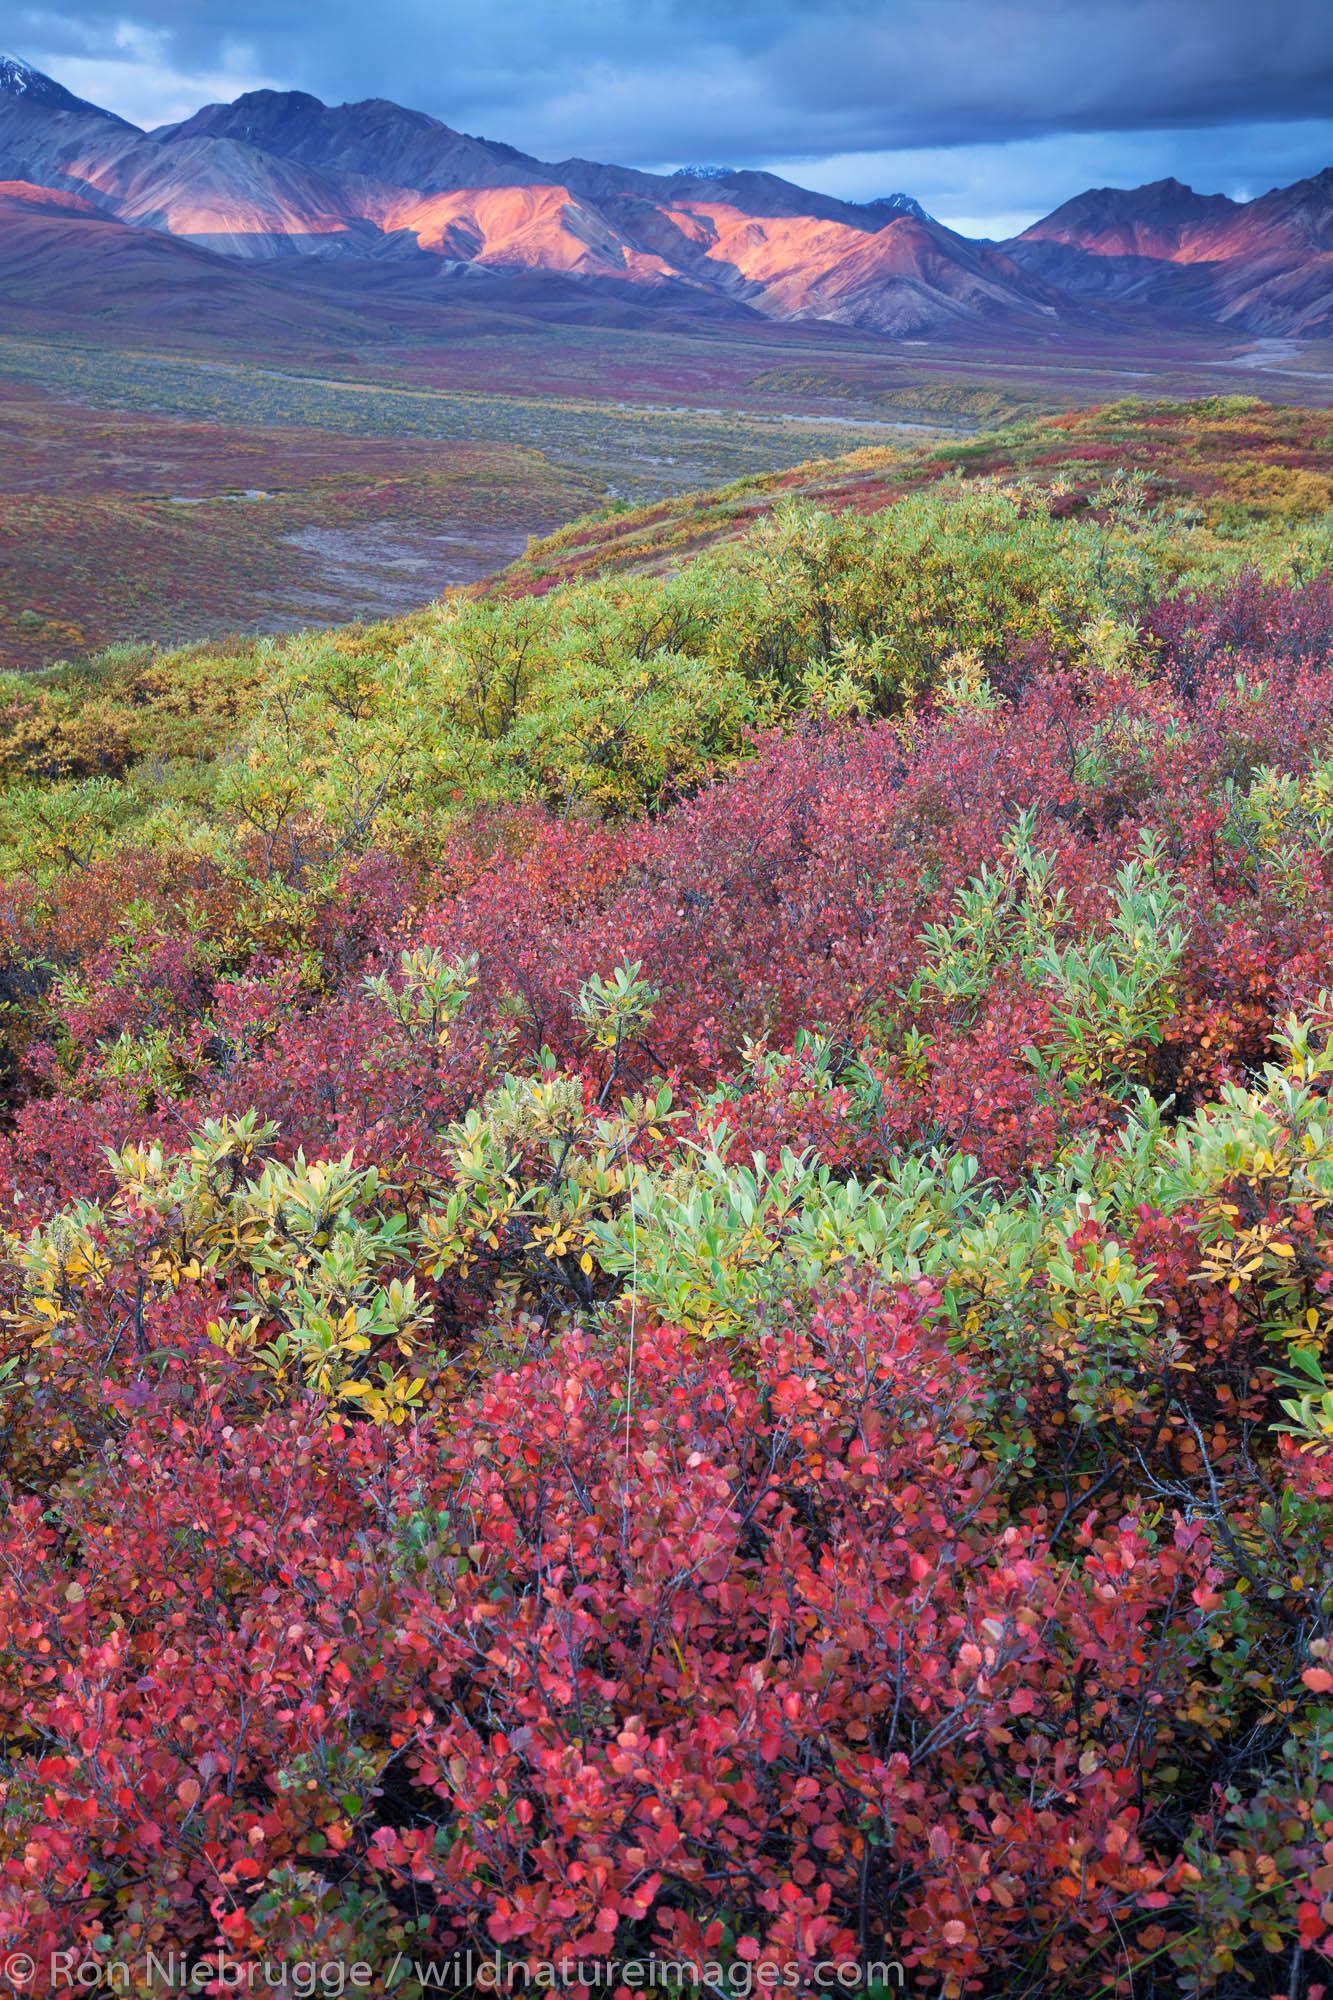 Fall colors in Polychrome Pass, Denali National Park, Alaska.